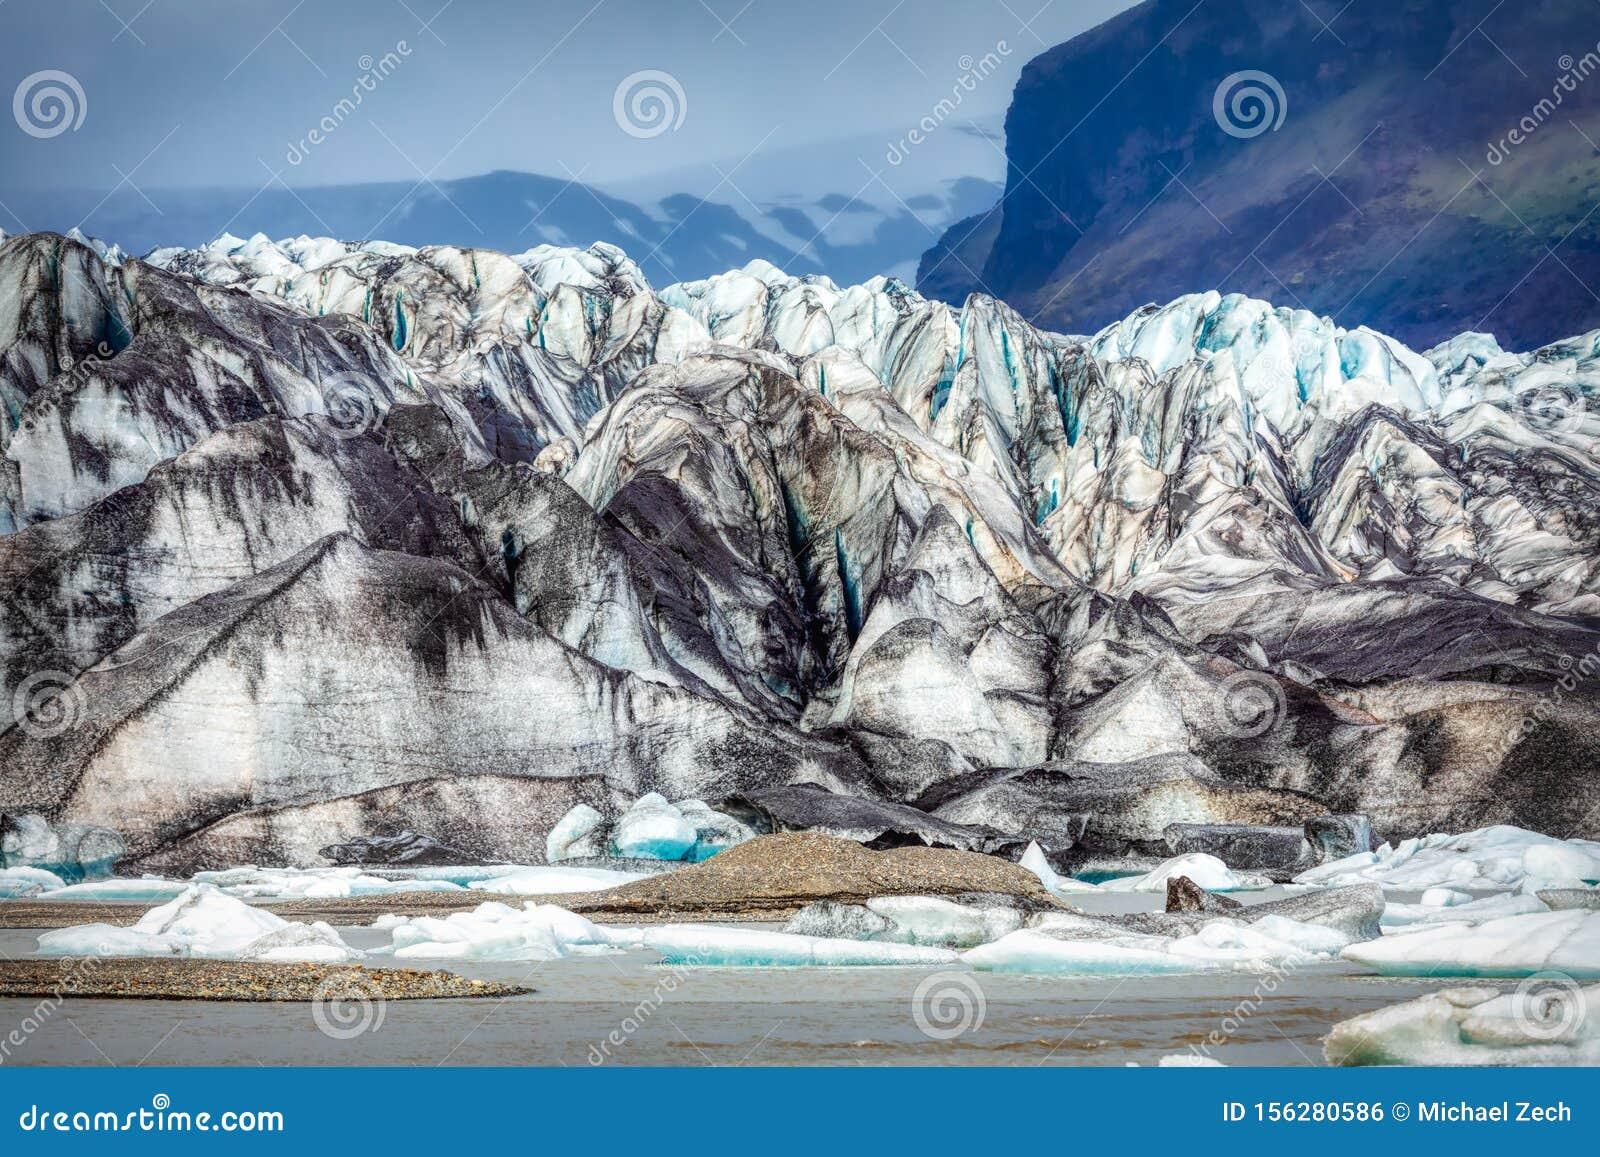 Beautiful blue shining glacier structure at the lagoon fjallsarlon on iceland